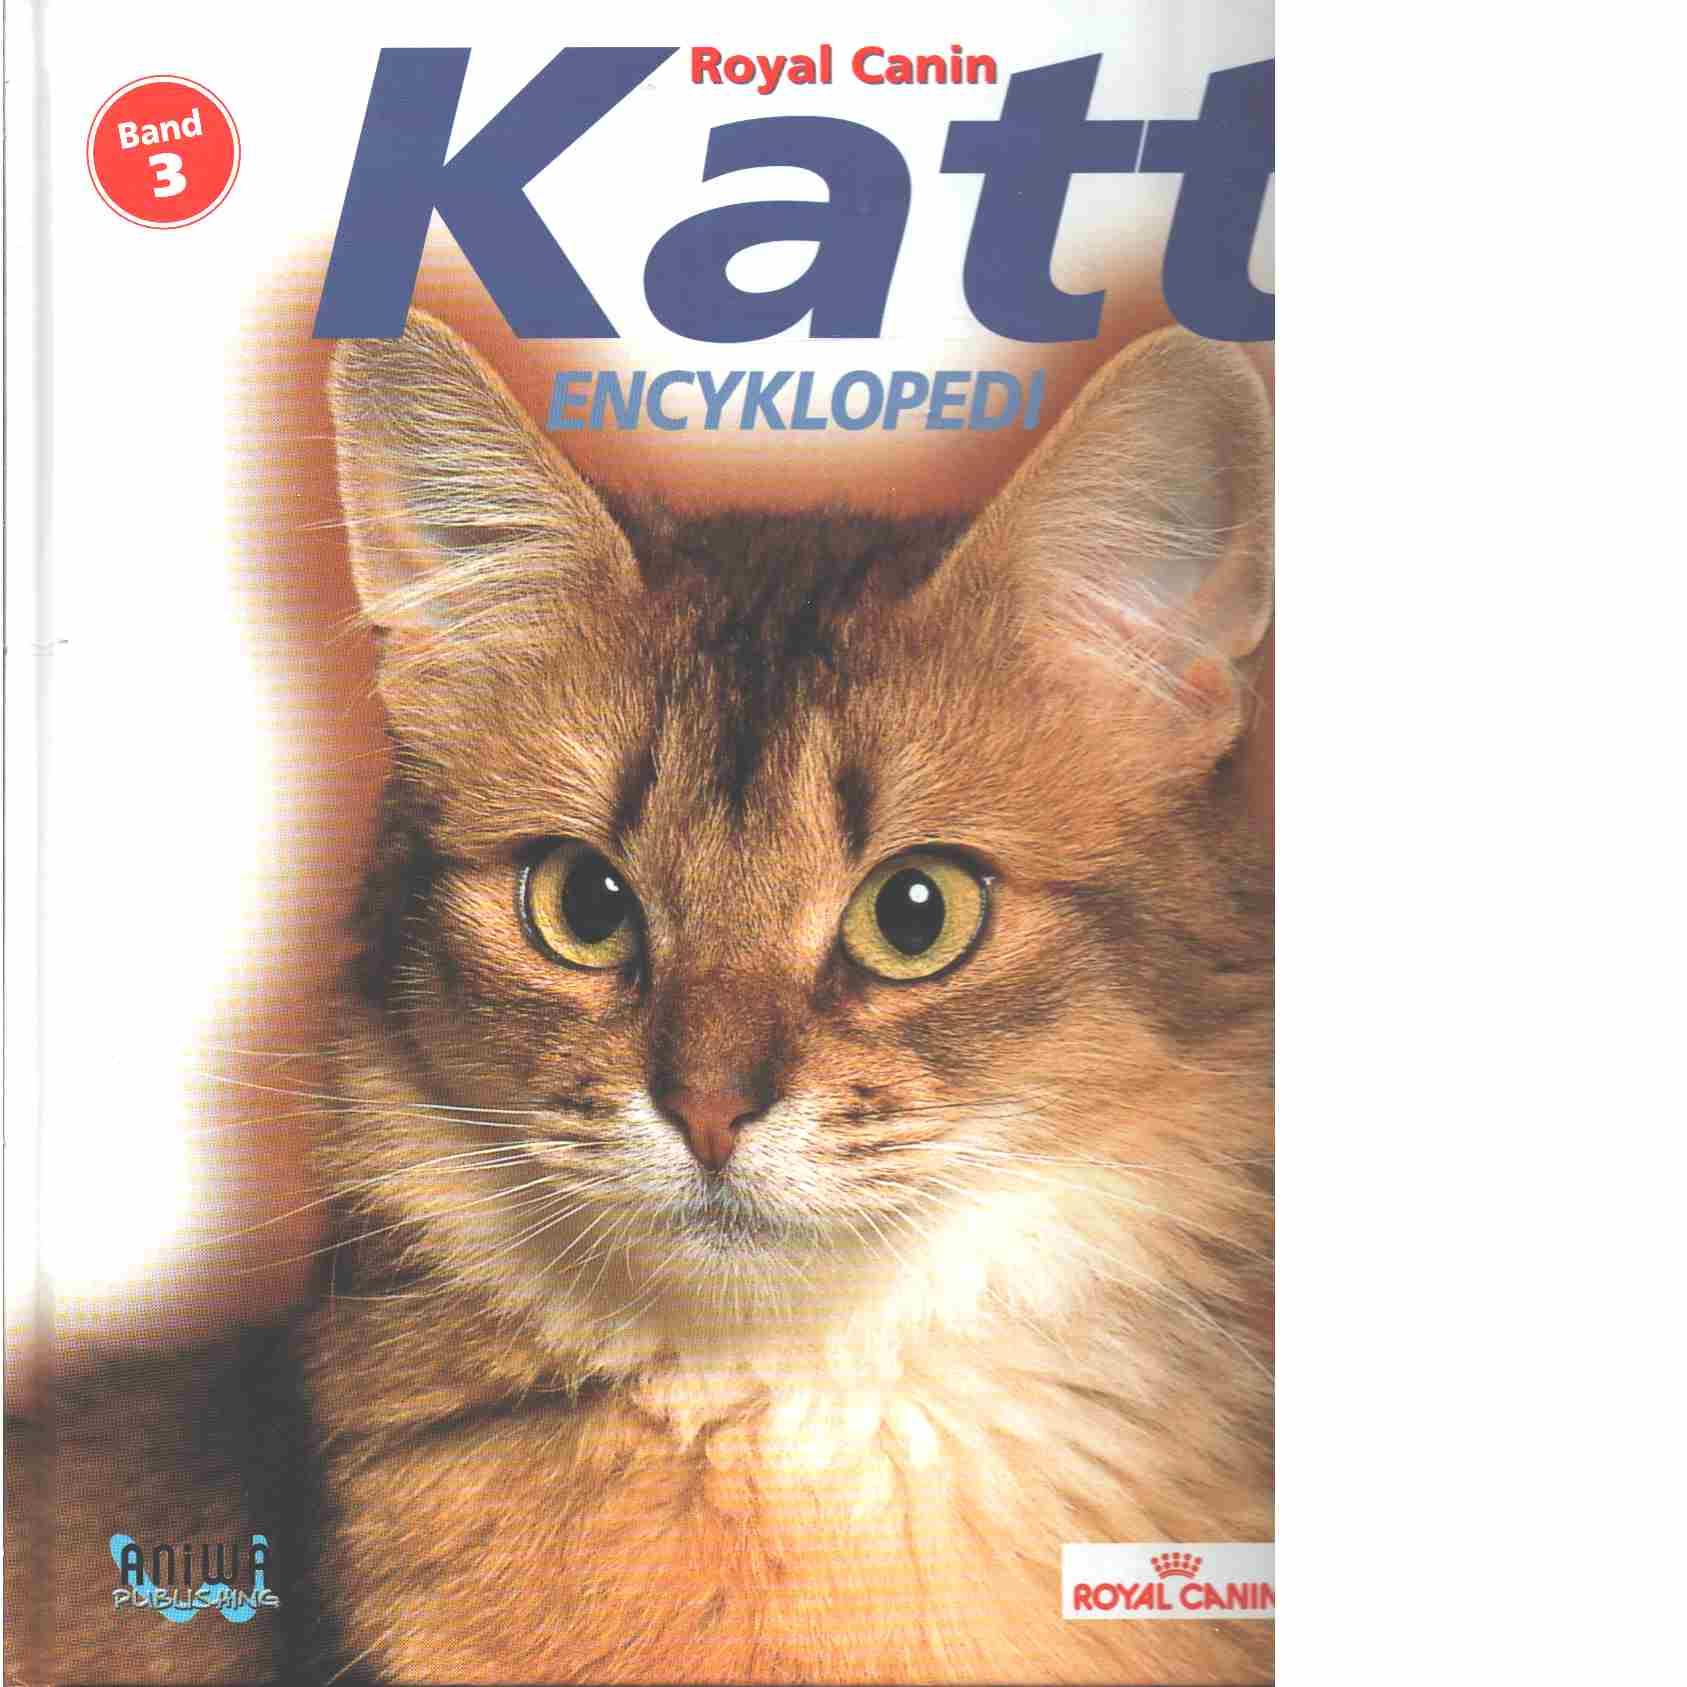 Katt encyklopedi : Bok 3 - Red. Royal Canin